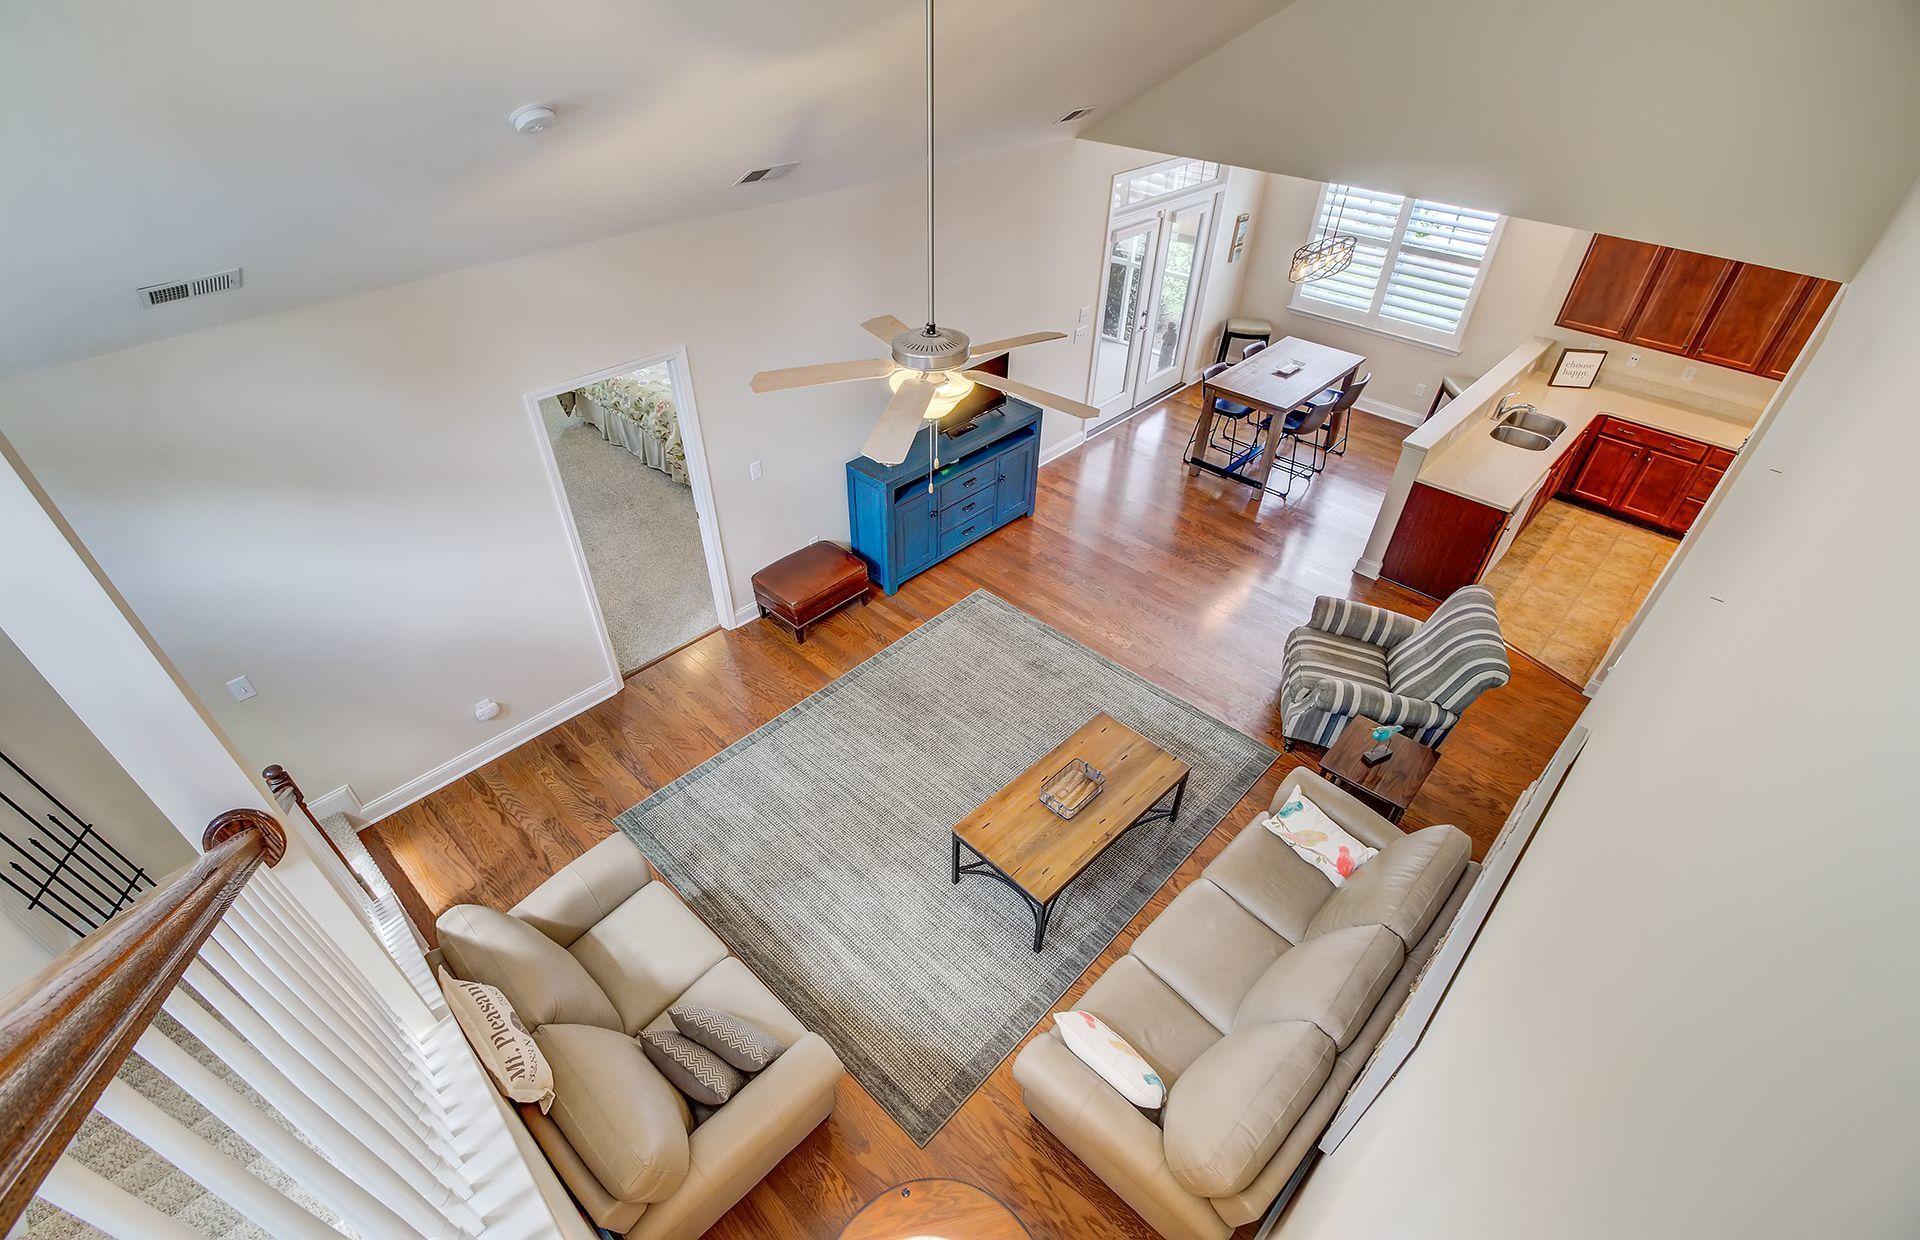 Linnen Place Homes For Sale - 1275 Shingleback, Mount Pleasant, SC - 15